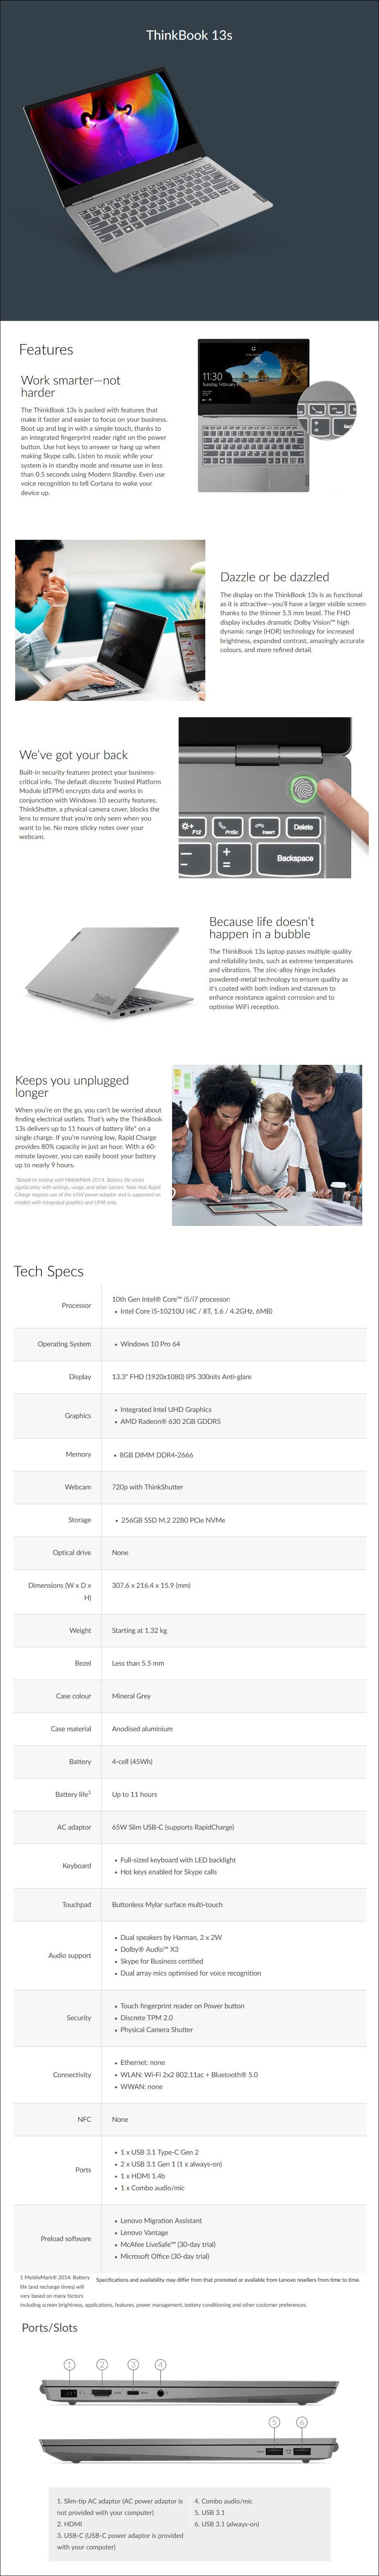 "Lenovo ThinkBook 13s 13.3"" Laptop i5-10210U 8GB 256GB SSD W10P - Overview 1"